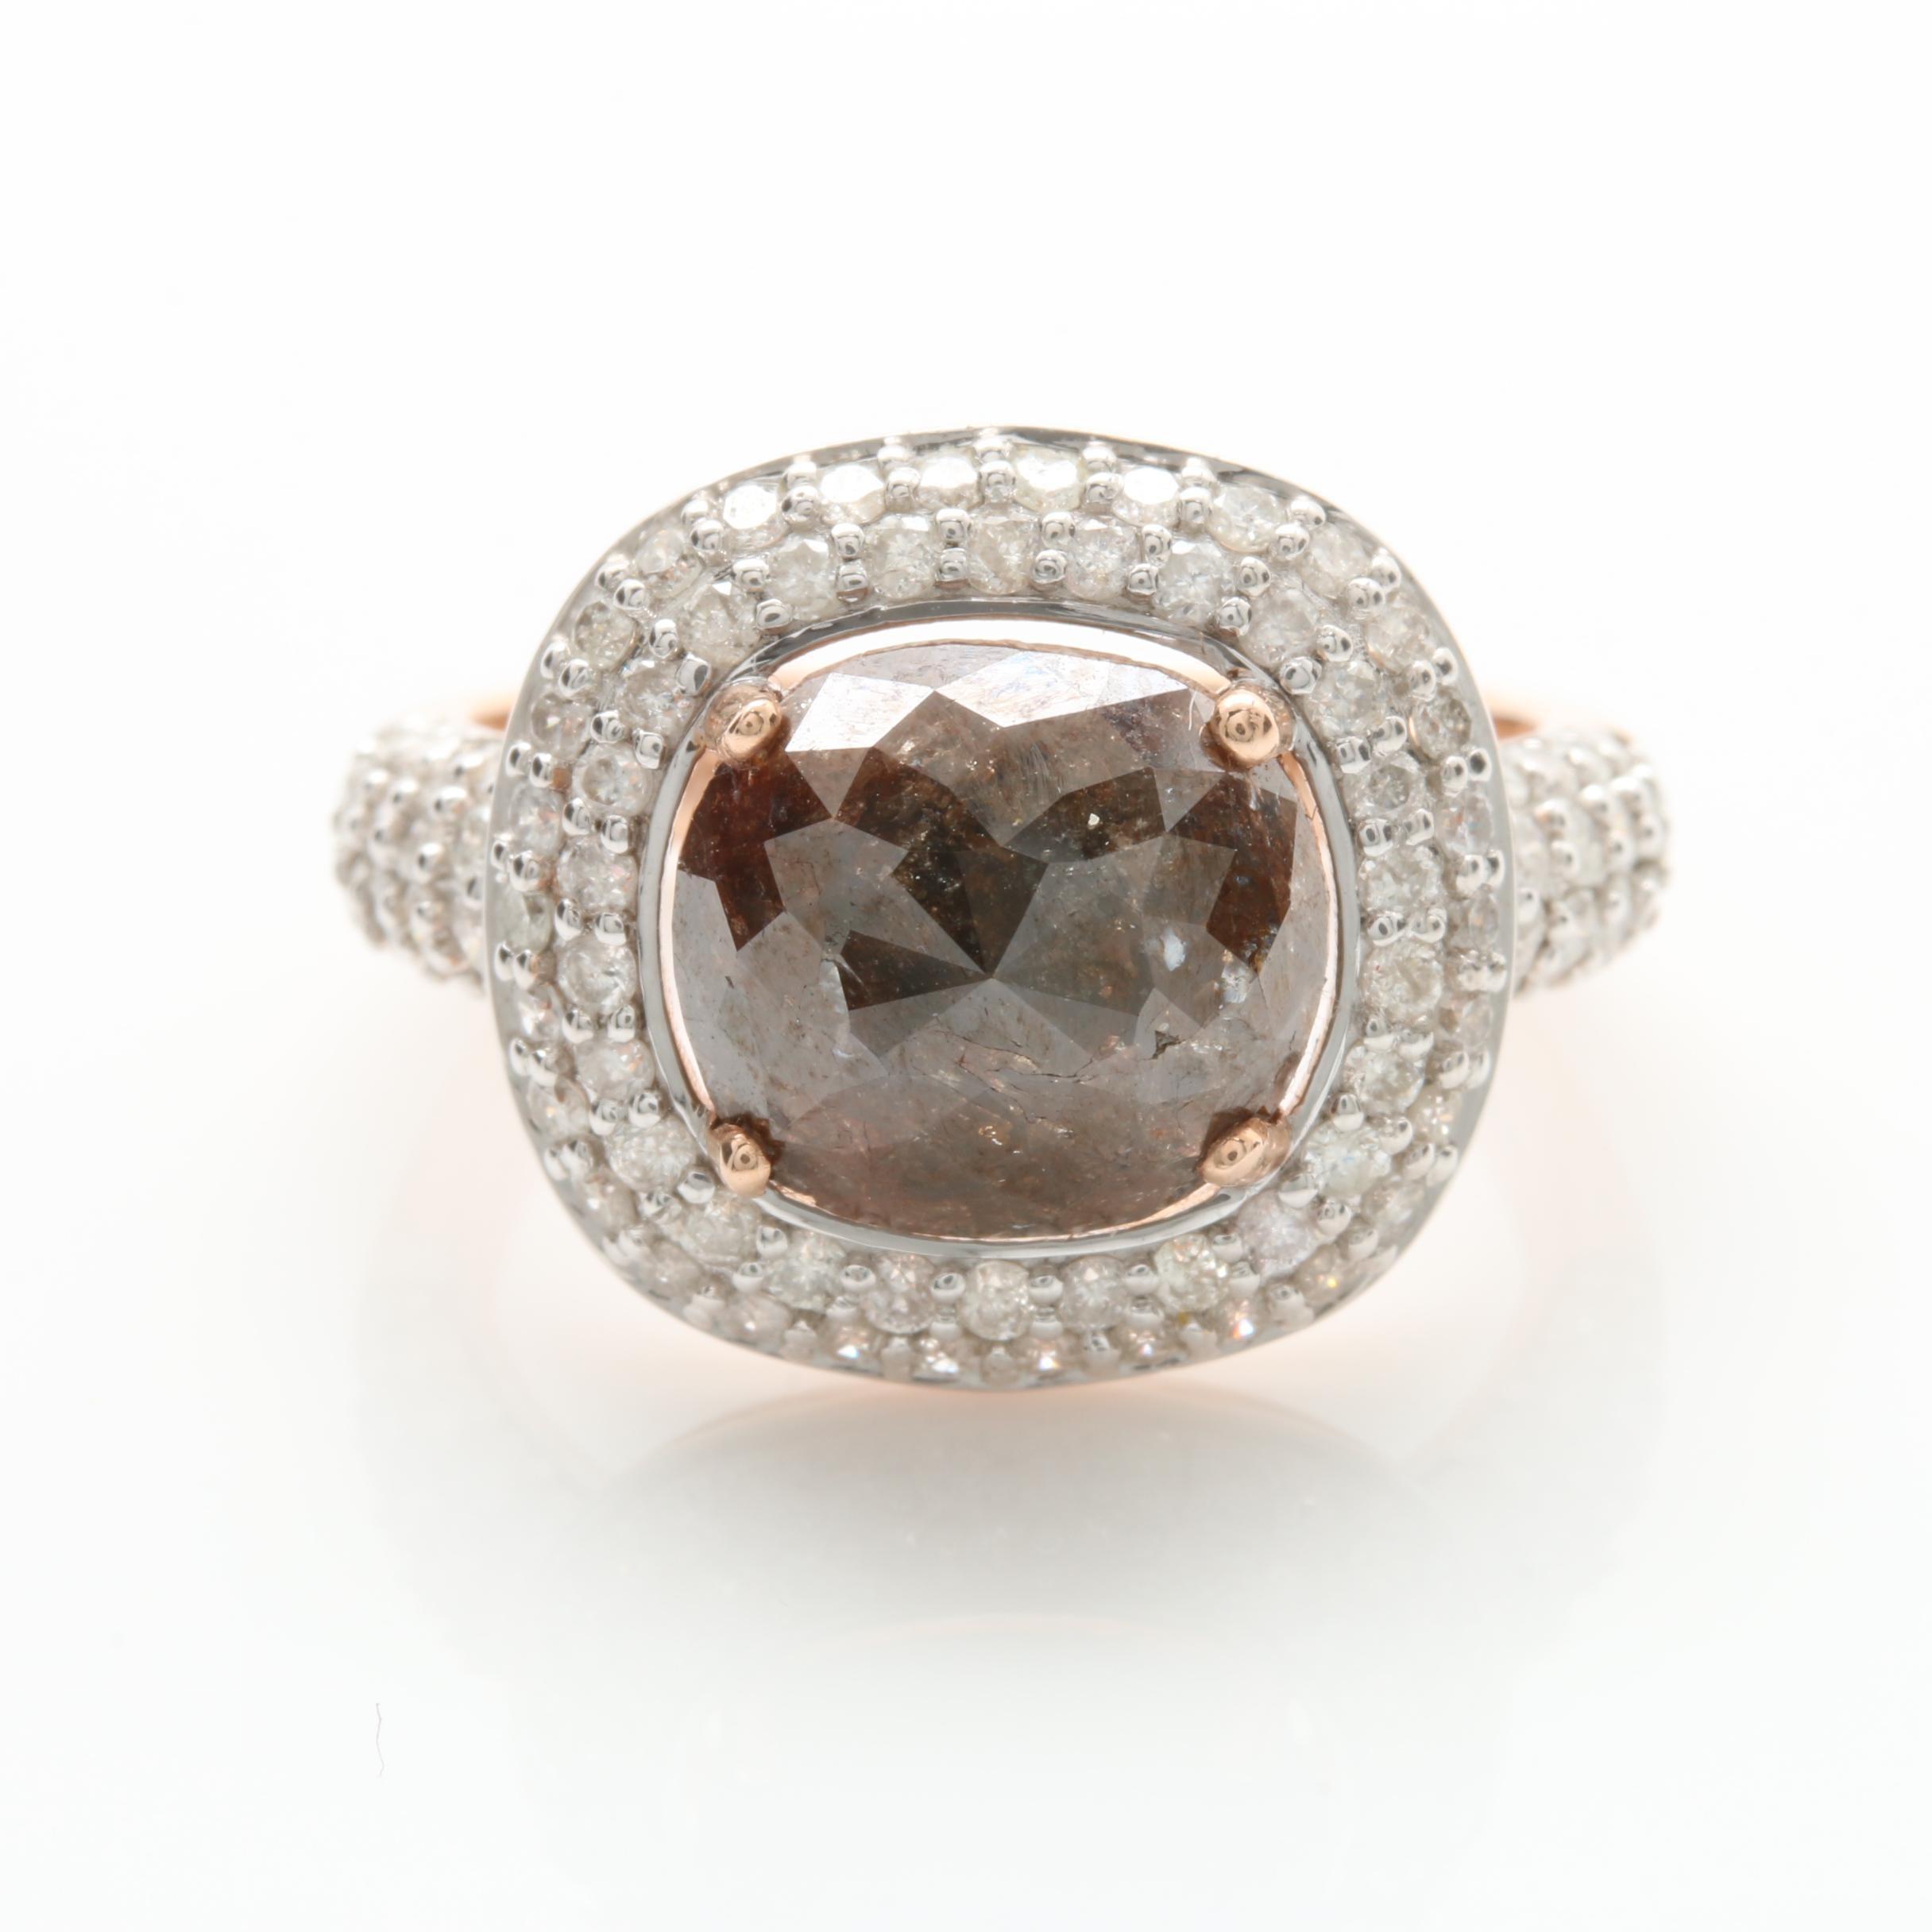 14K Rose Gold 1.72 CTW Diamond Ring